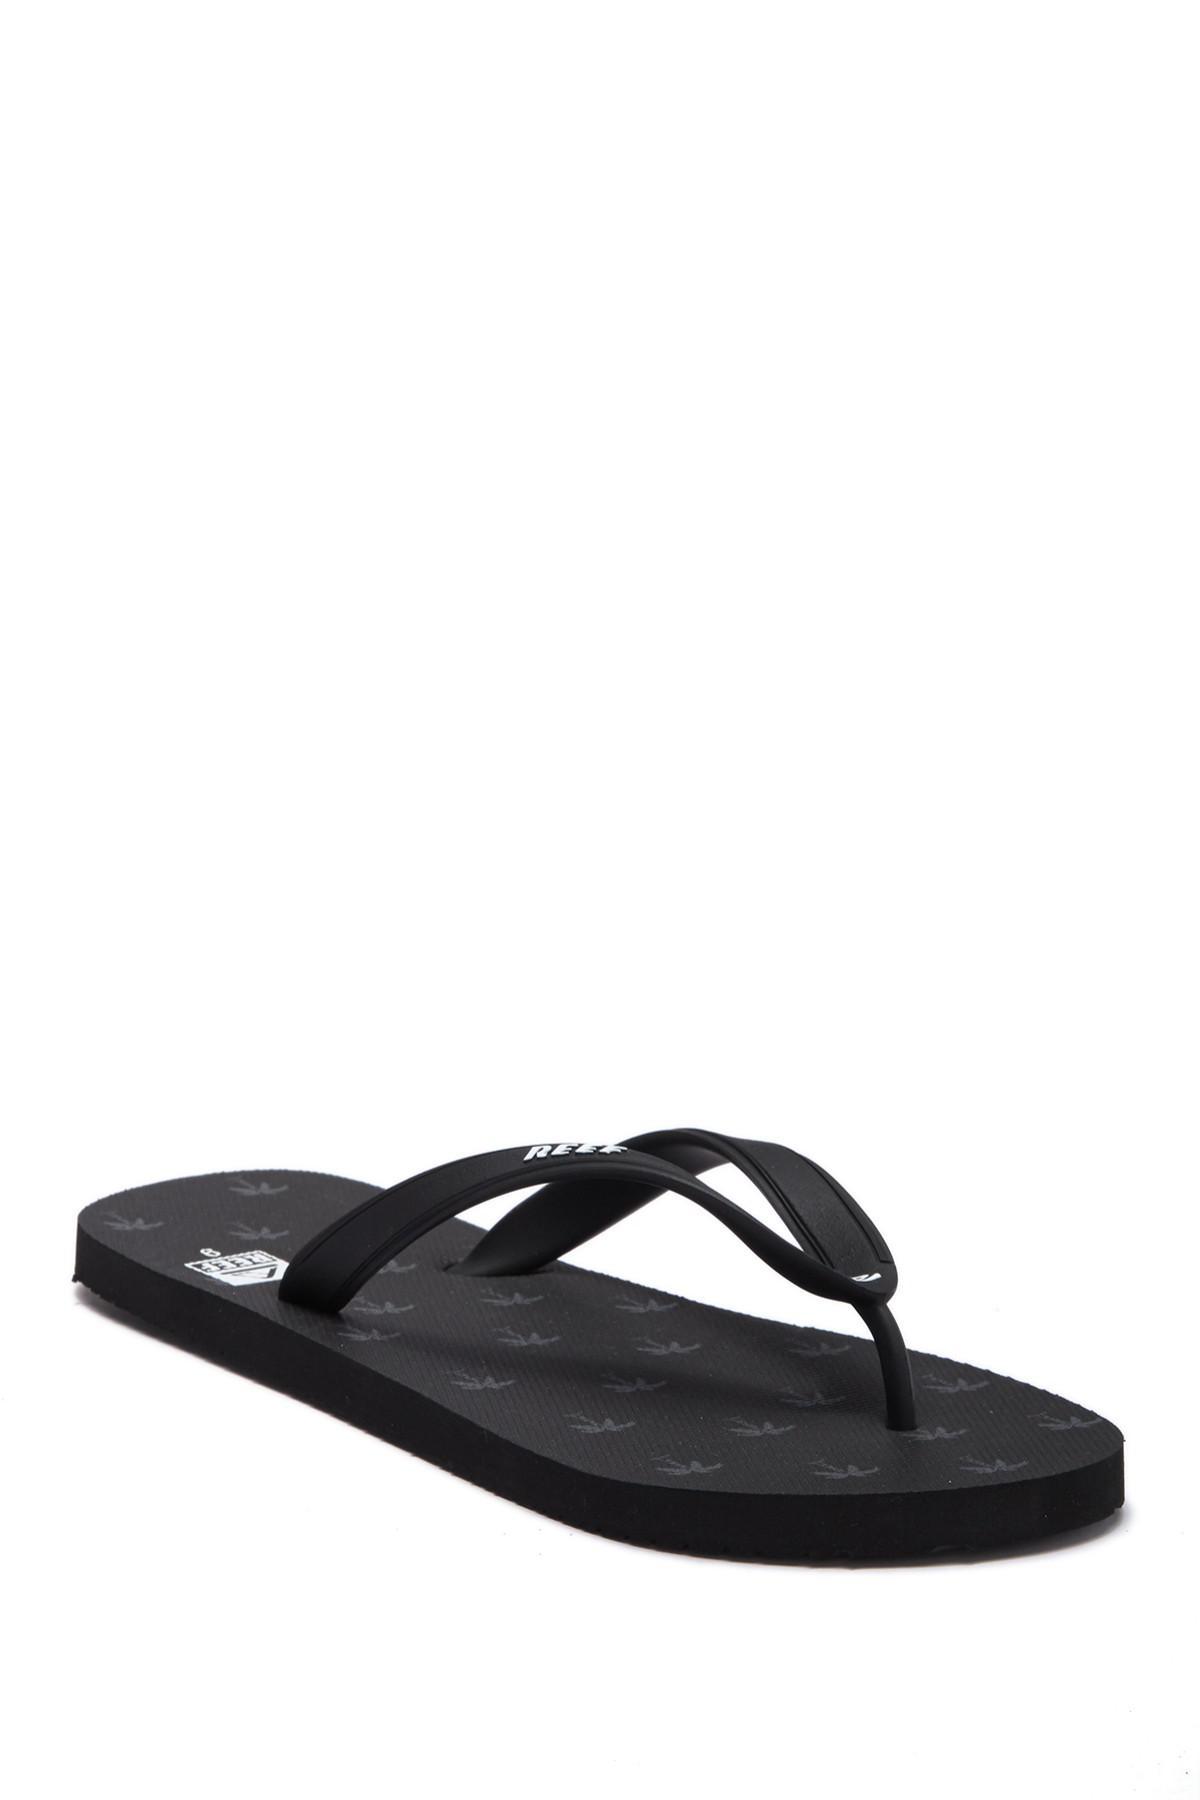 339dd937f685 Lyst - Reef Switchfoot Print Flip Flop in Black for Men